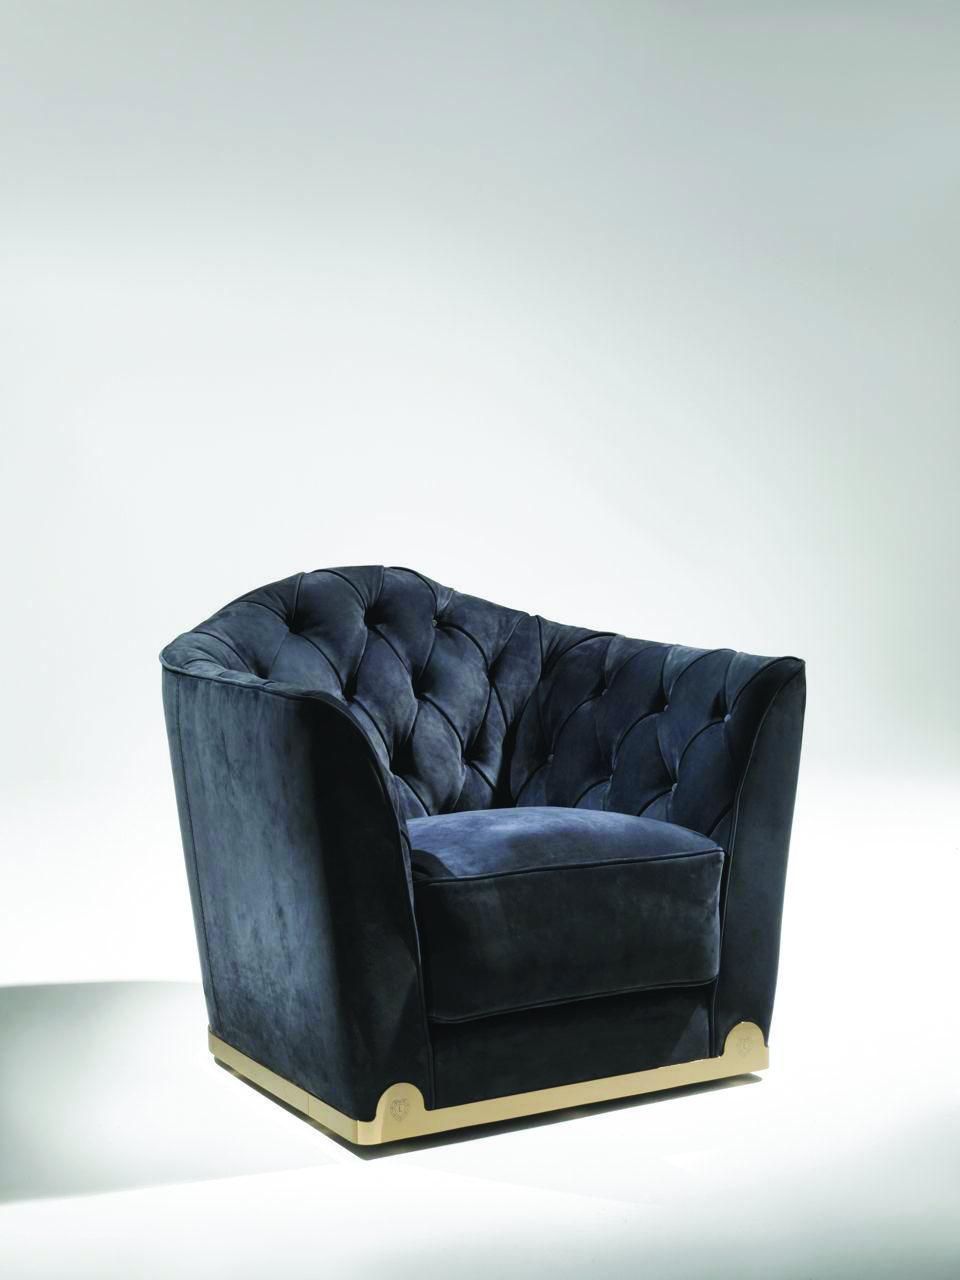 Longhi Grace Sofa Design Modern Sofa Designs Single Sofa Chair